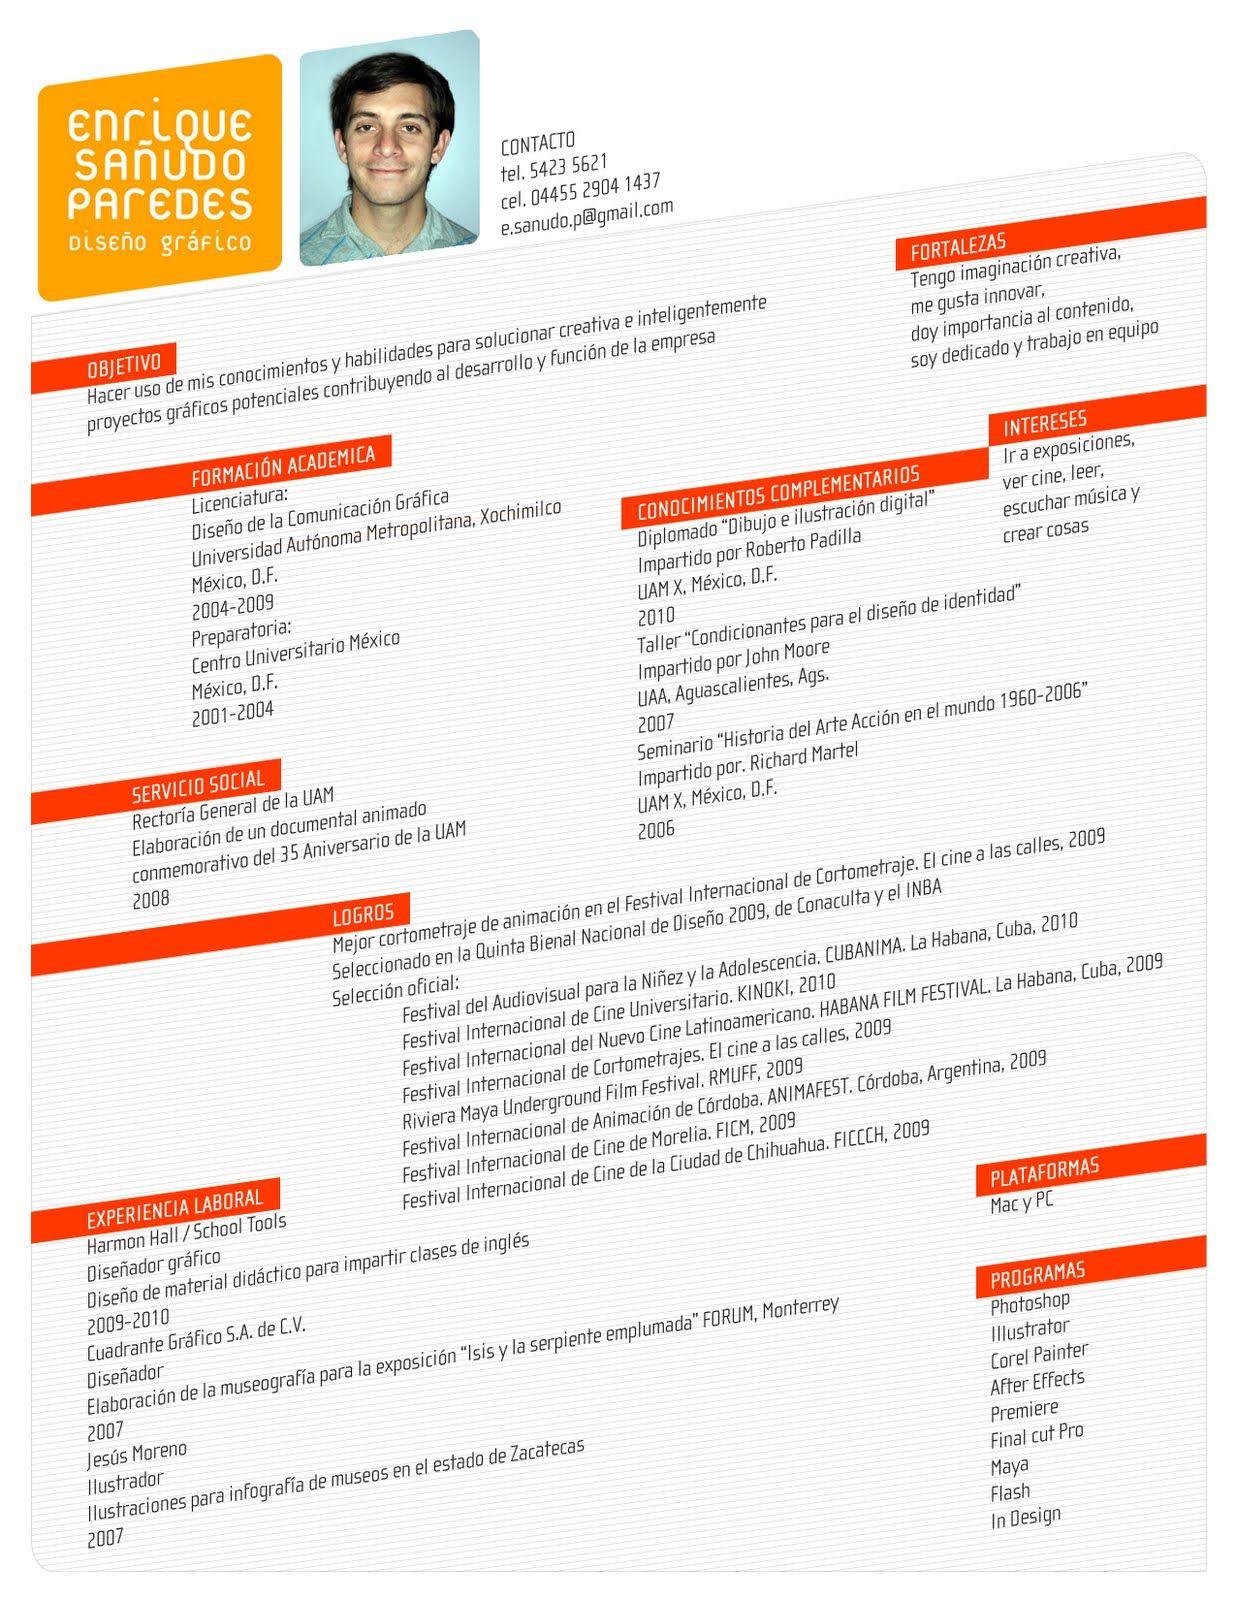 Creative Curriculum Vitae #CV | Professional Help | Pinterest ...